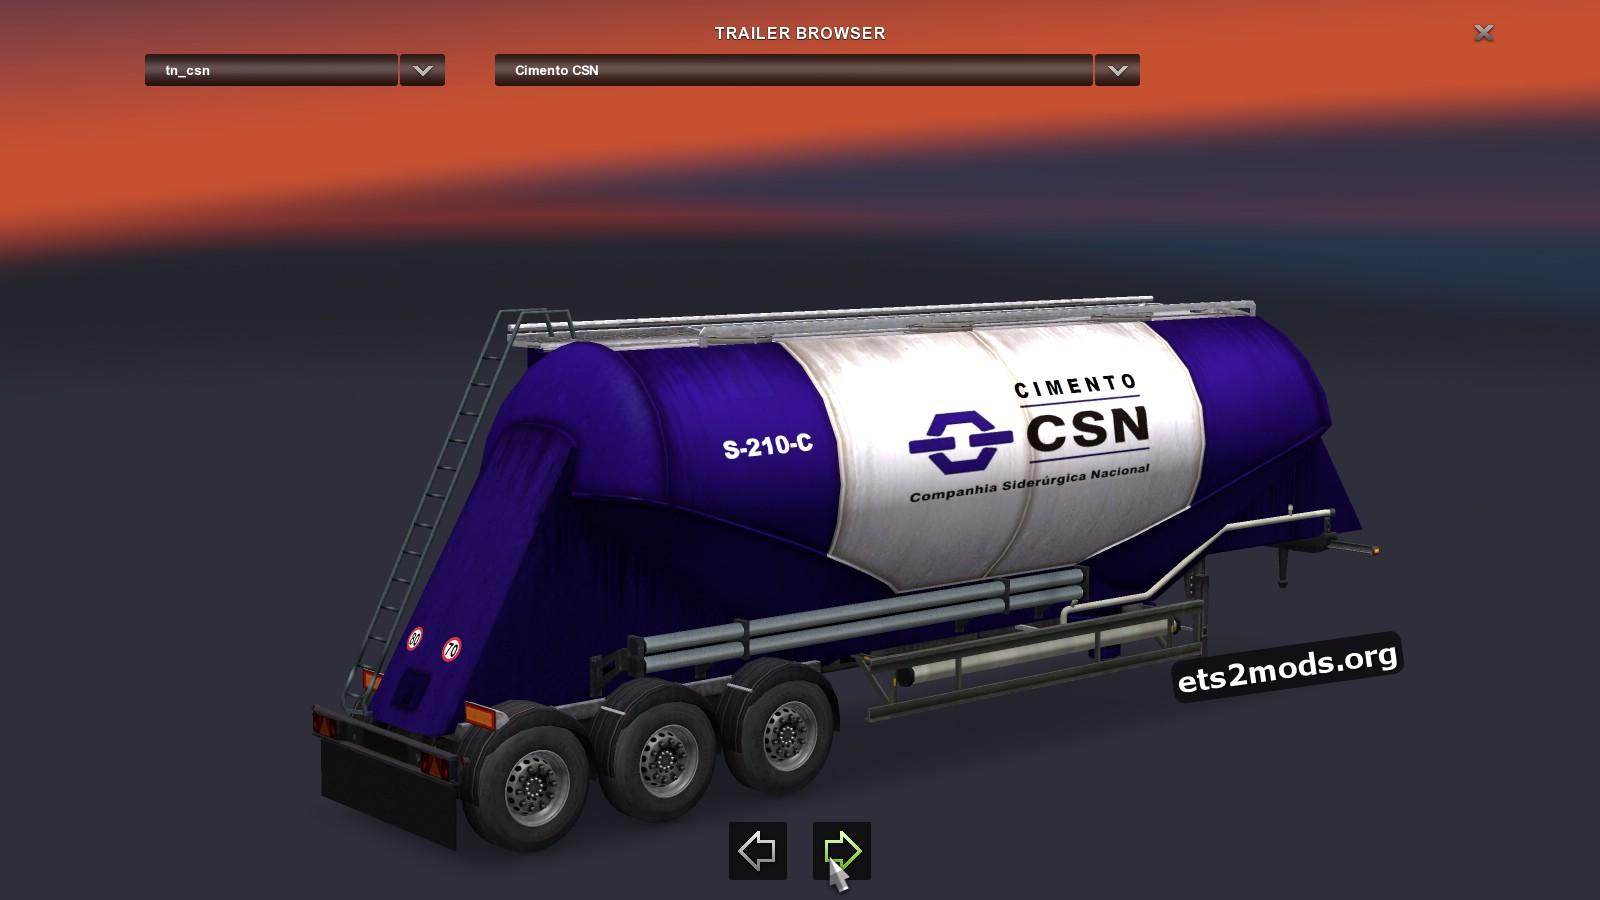 Silo Cement Pack - Brazilian Companies